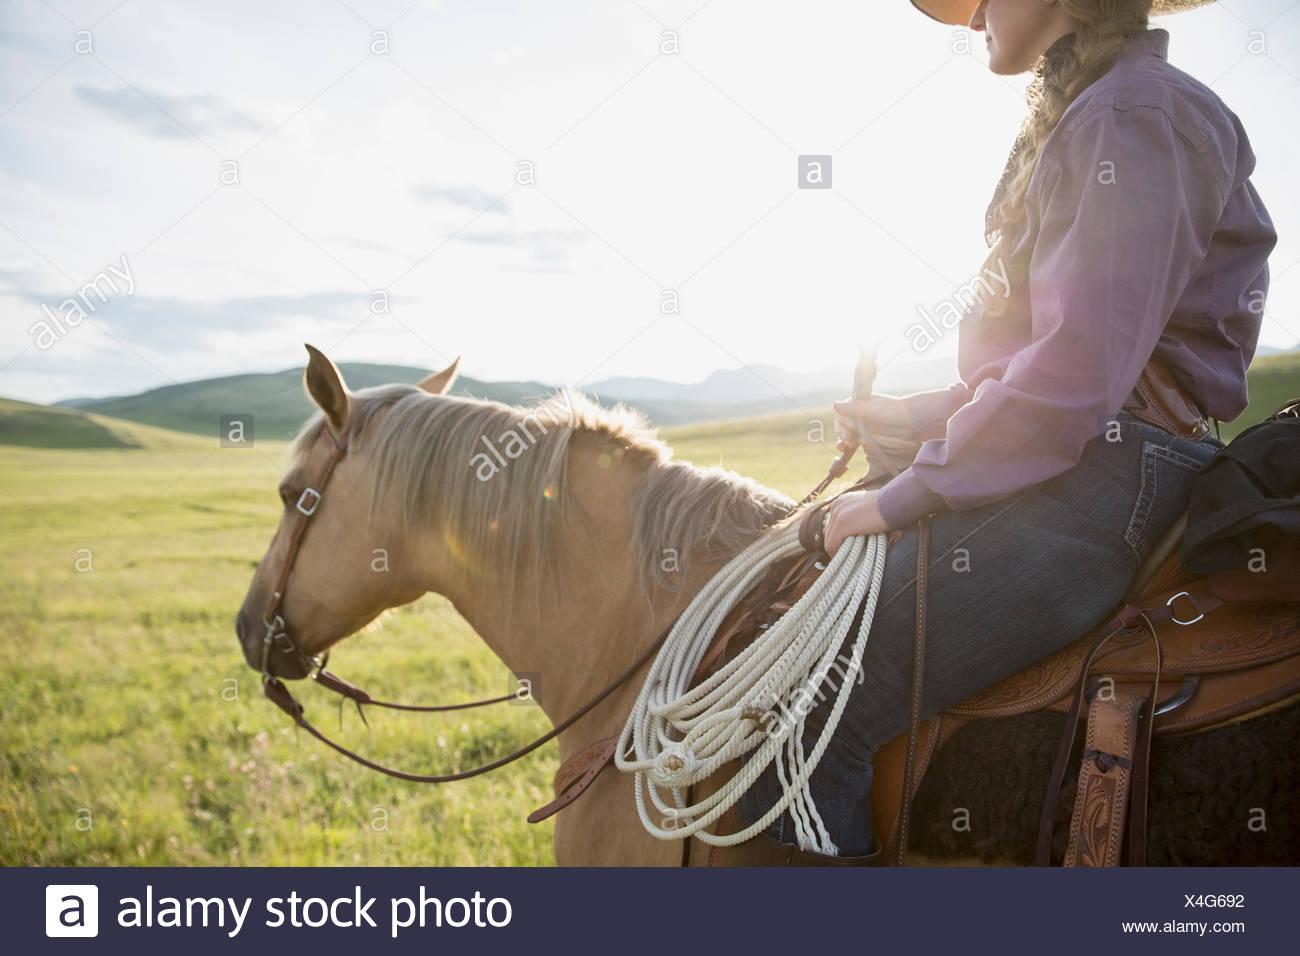 Female rancher horseback riding in sunny remote field - Stock Image